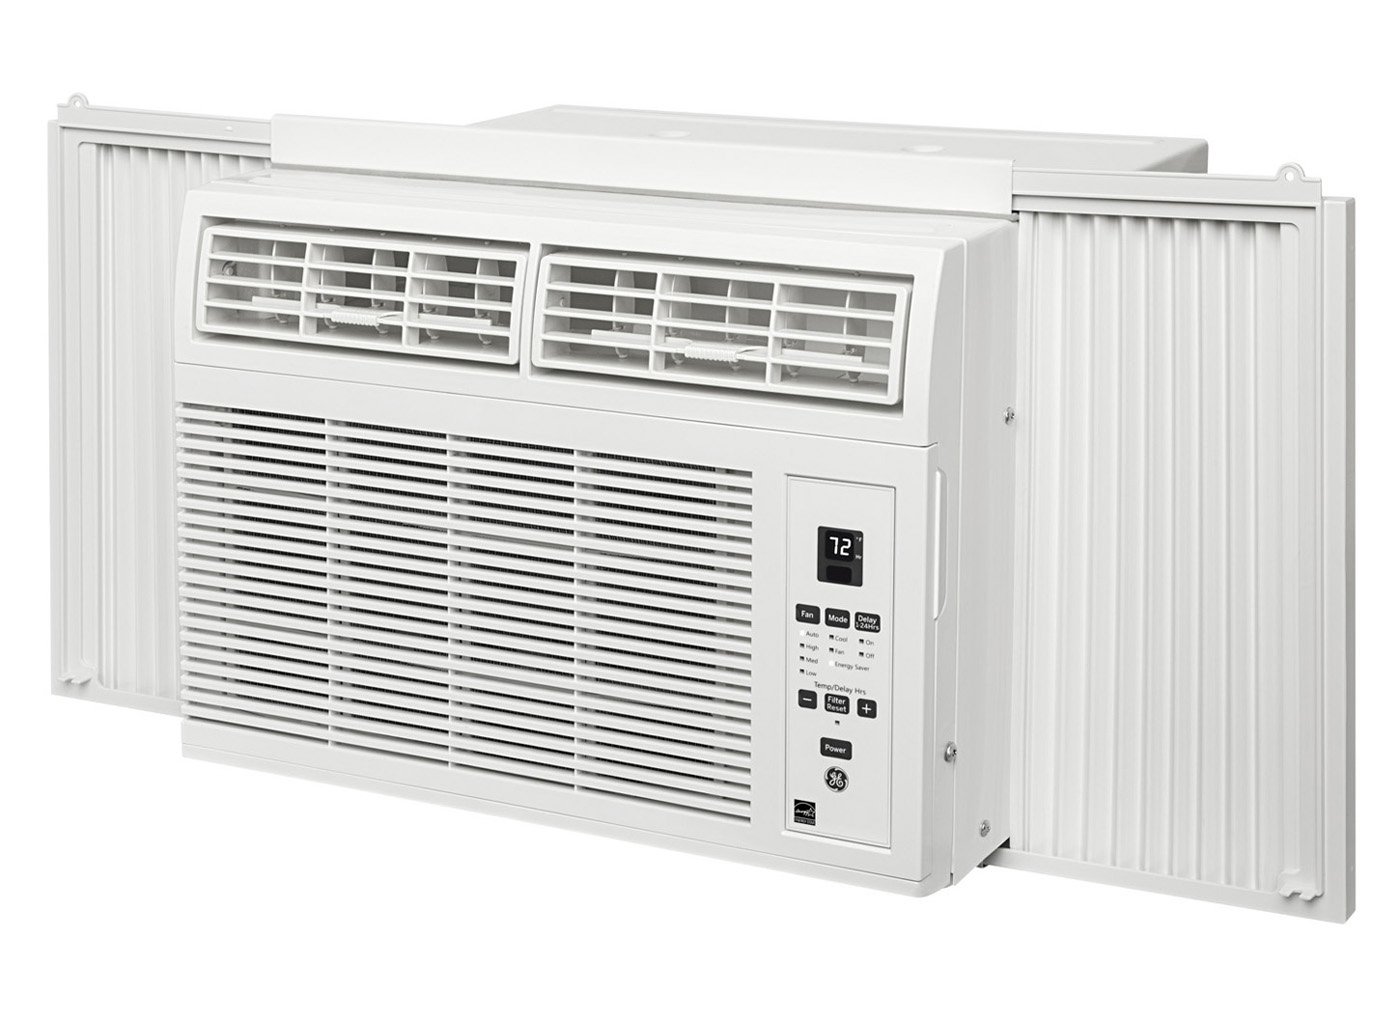 Ge 8 000 Btu 12 1 Eer 115v Window Air Conditioner Ahm08lw